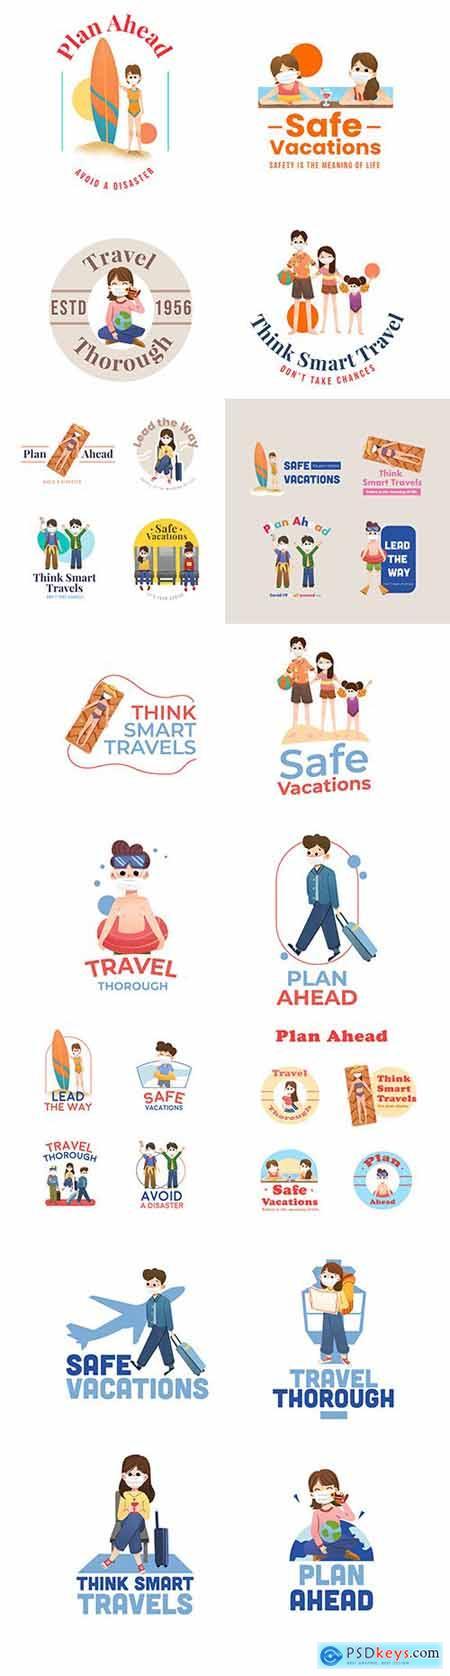 Brand name company logos business corporate design 81